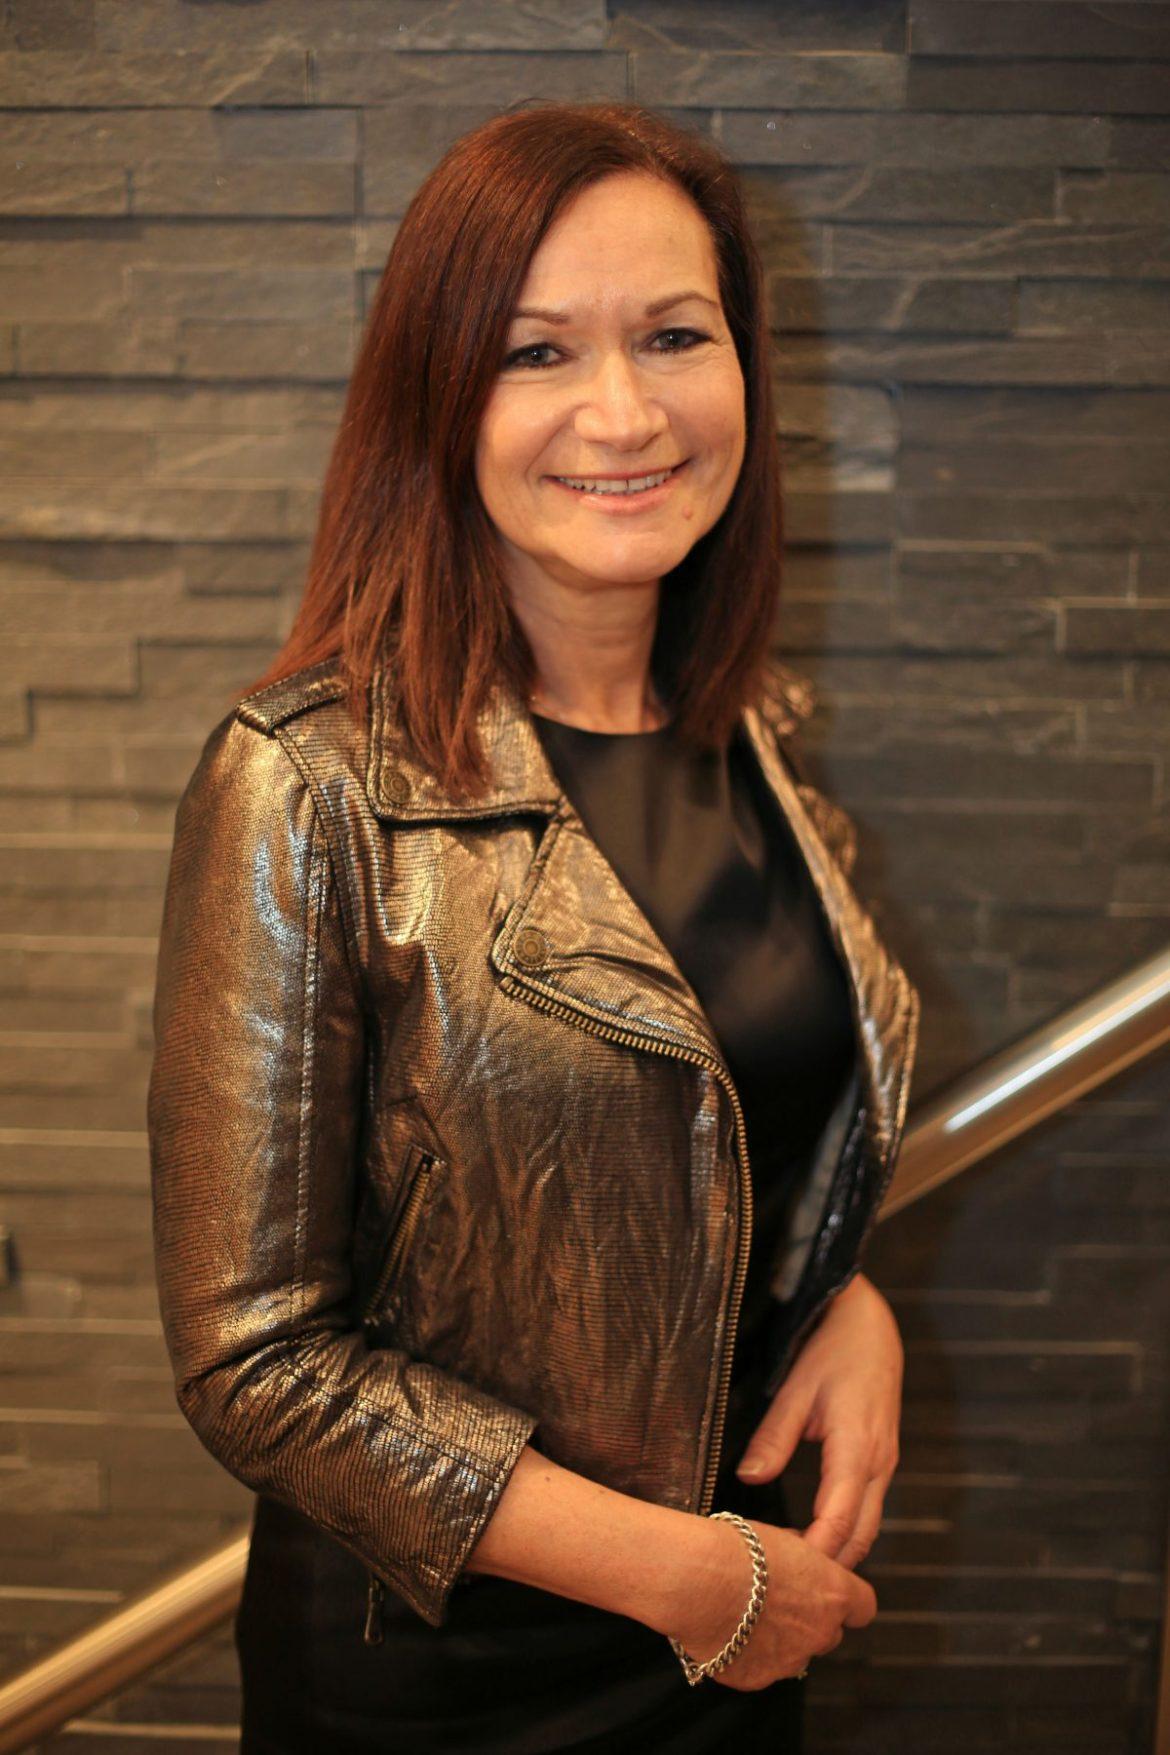 Dr Mair Fashion Psychologist